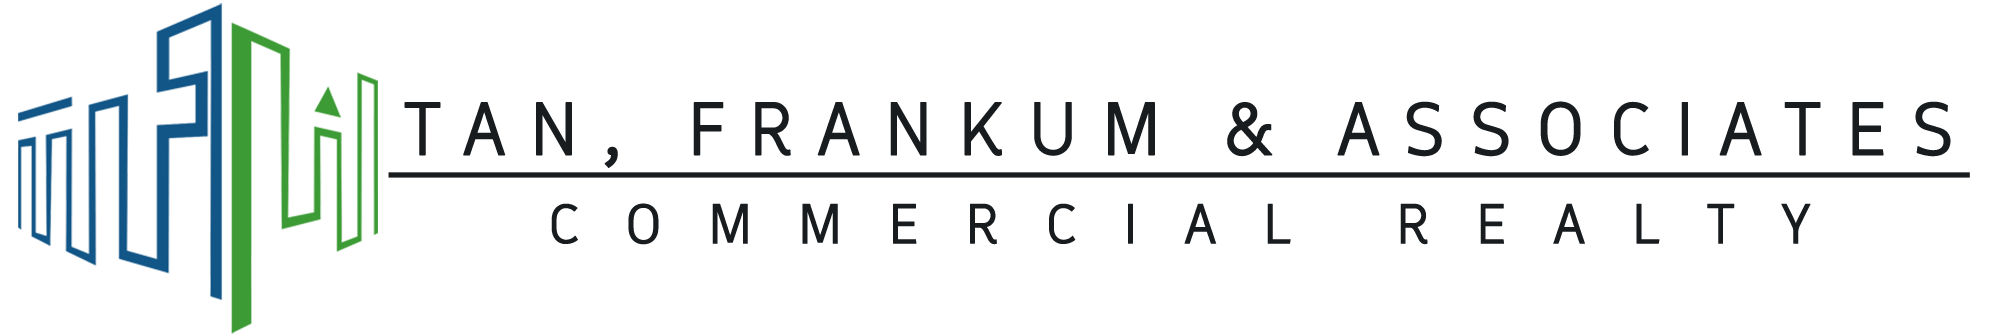 Tan, Frankum & Associates